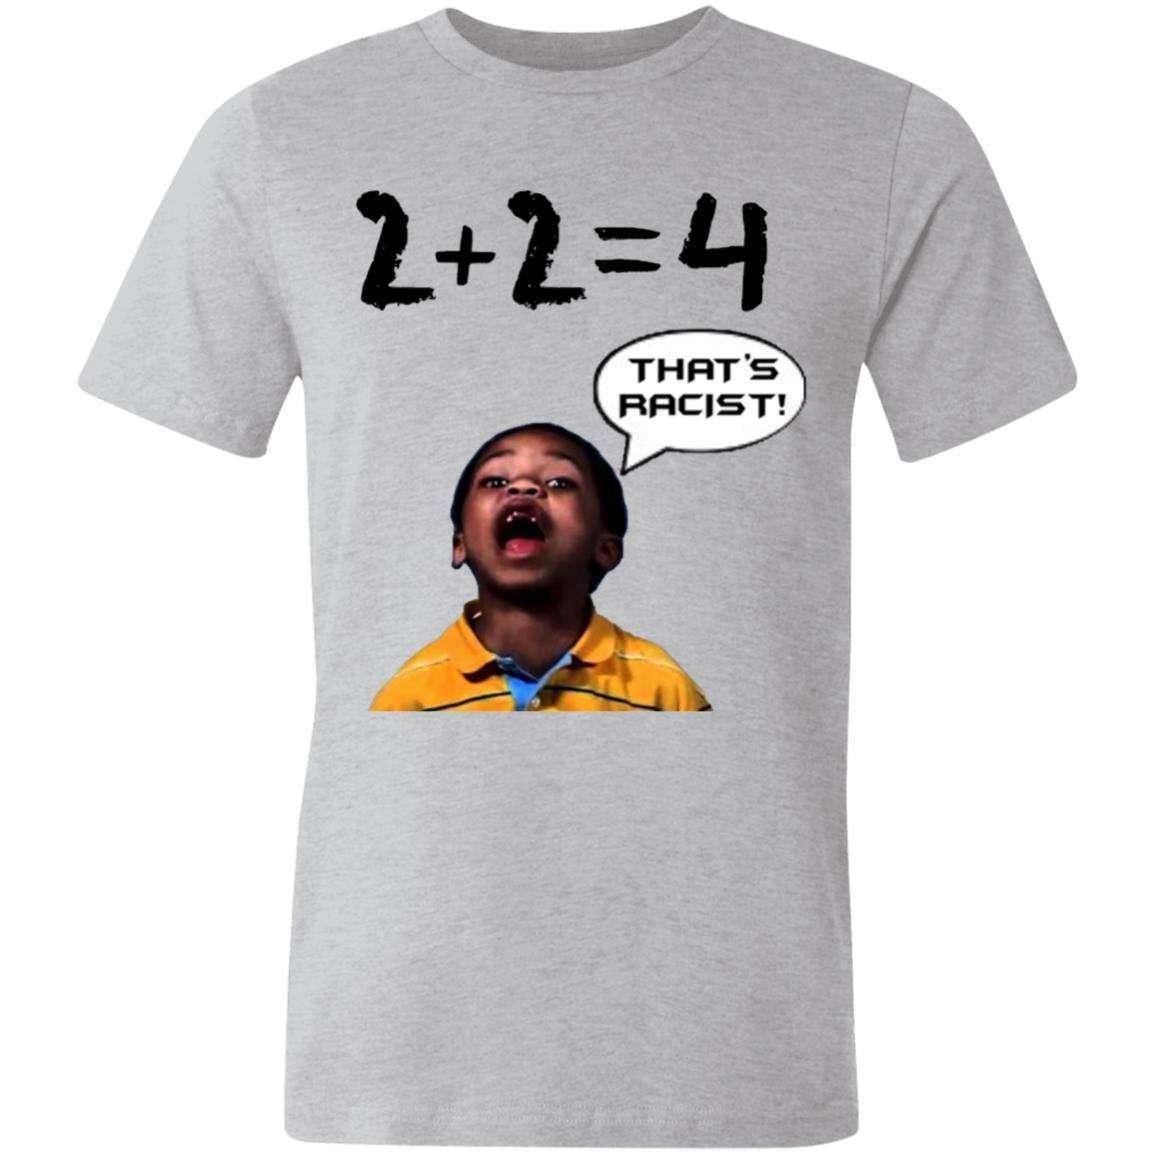 2+2= 4 That's Racist T-Shirt (6 Variants)